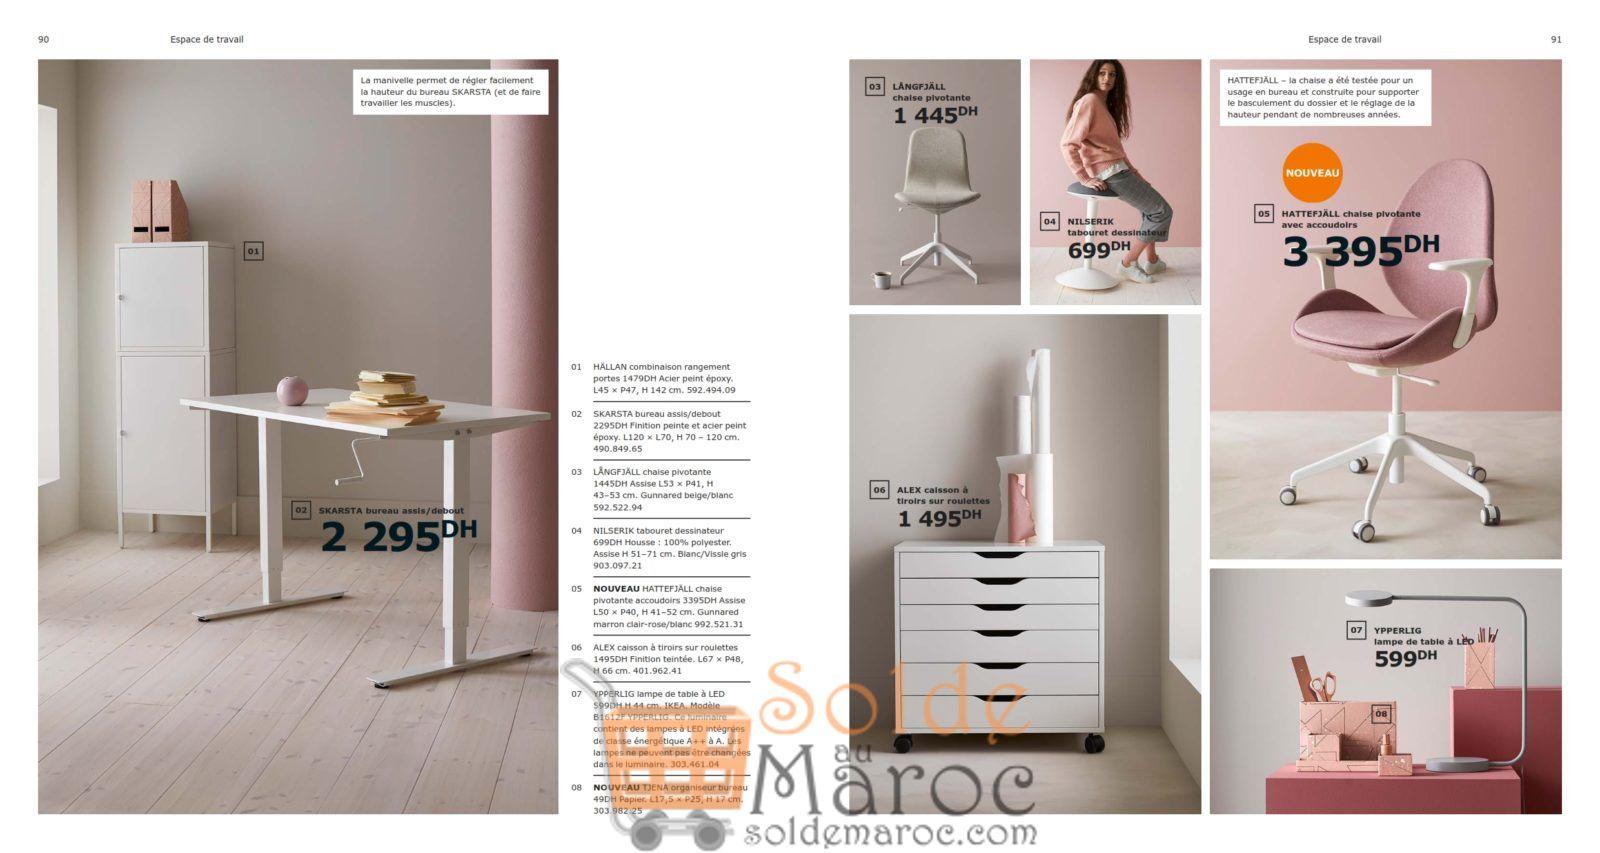 Chaise bureau ikea maroc: chaise haute bebe ikea maroc vinny oleo